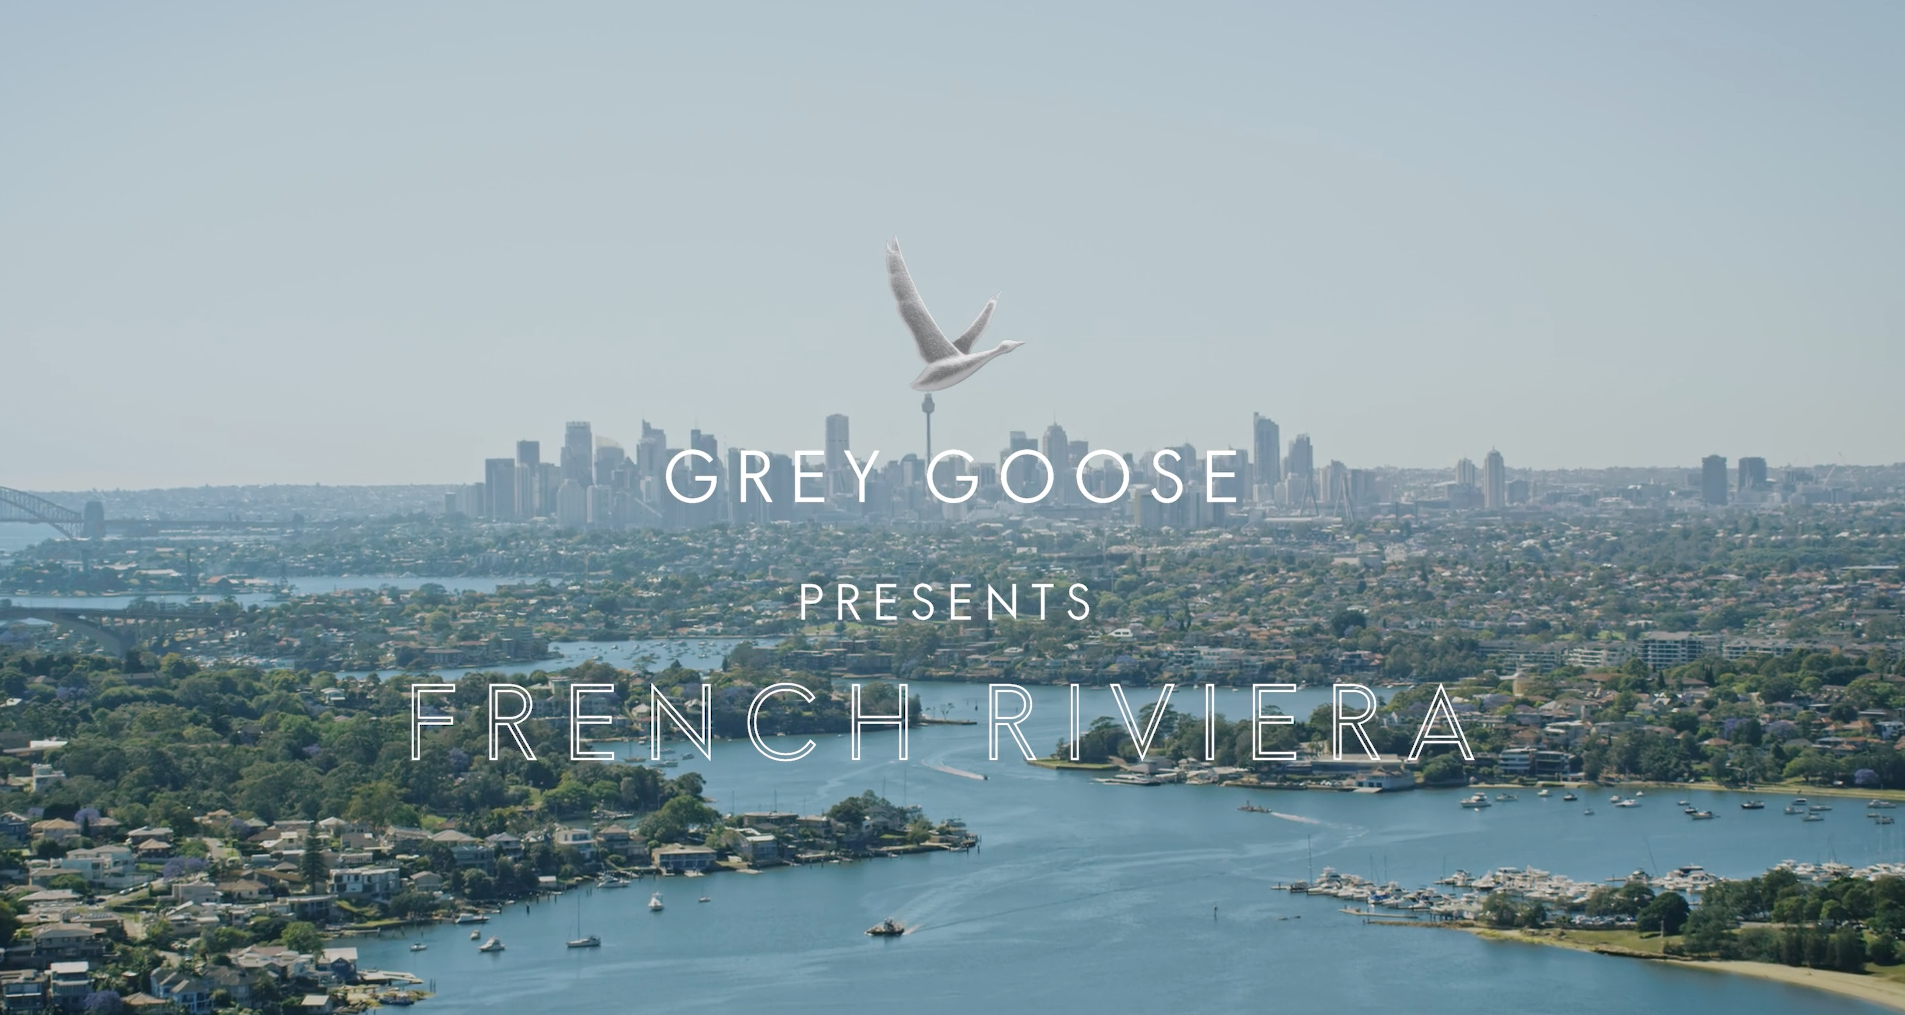 FunAir Yacht Slide Grey Goose french riviera